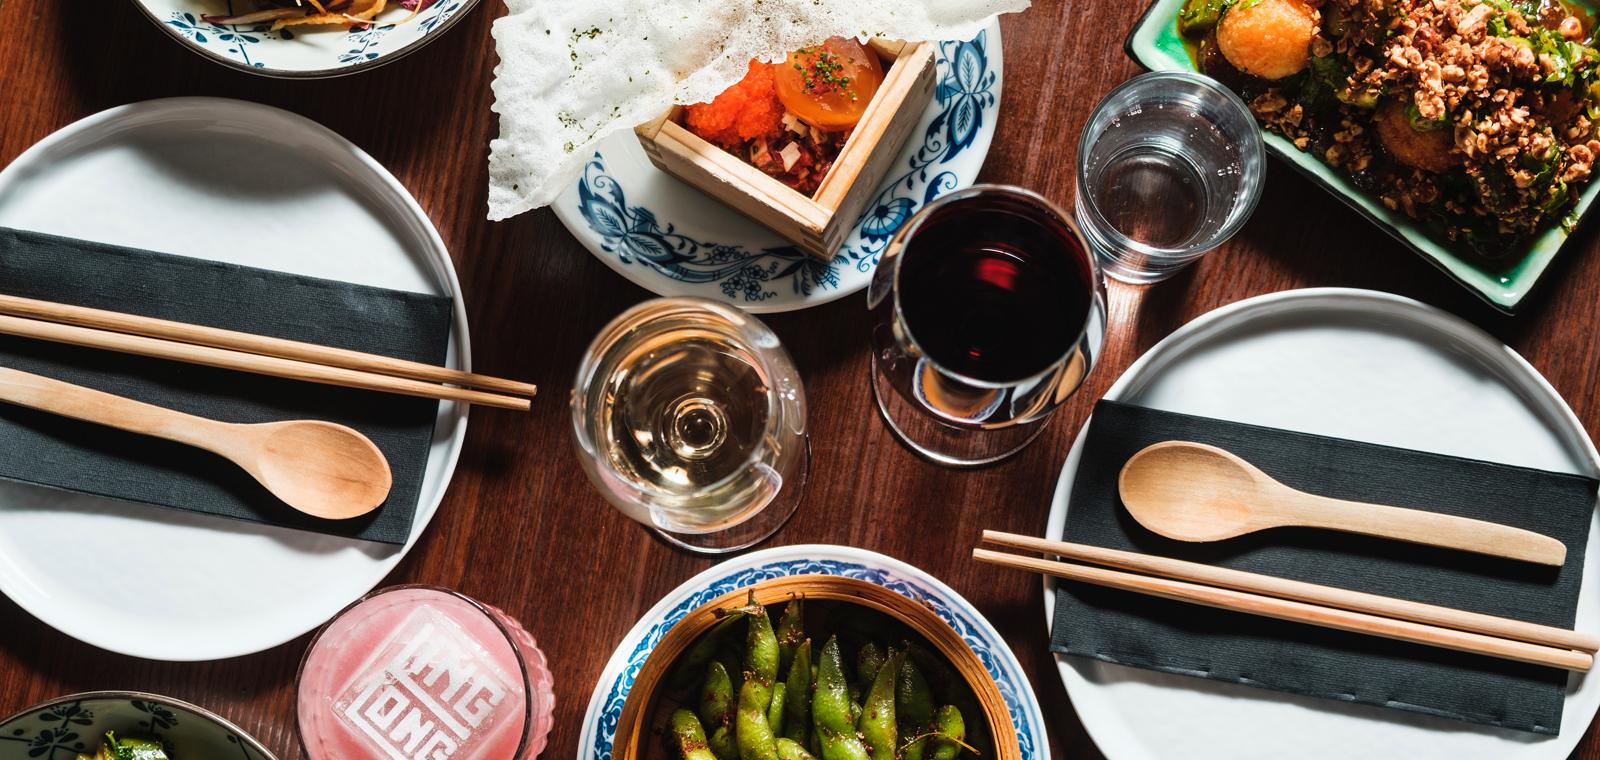 ARNJD-LingLong-food